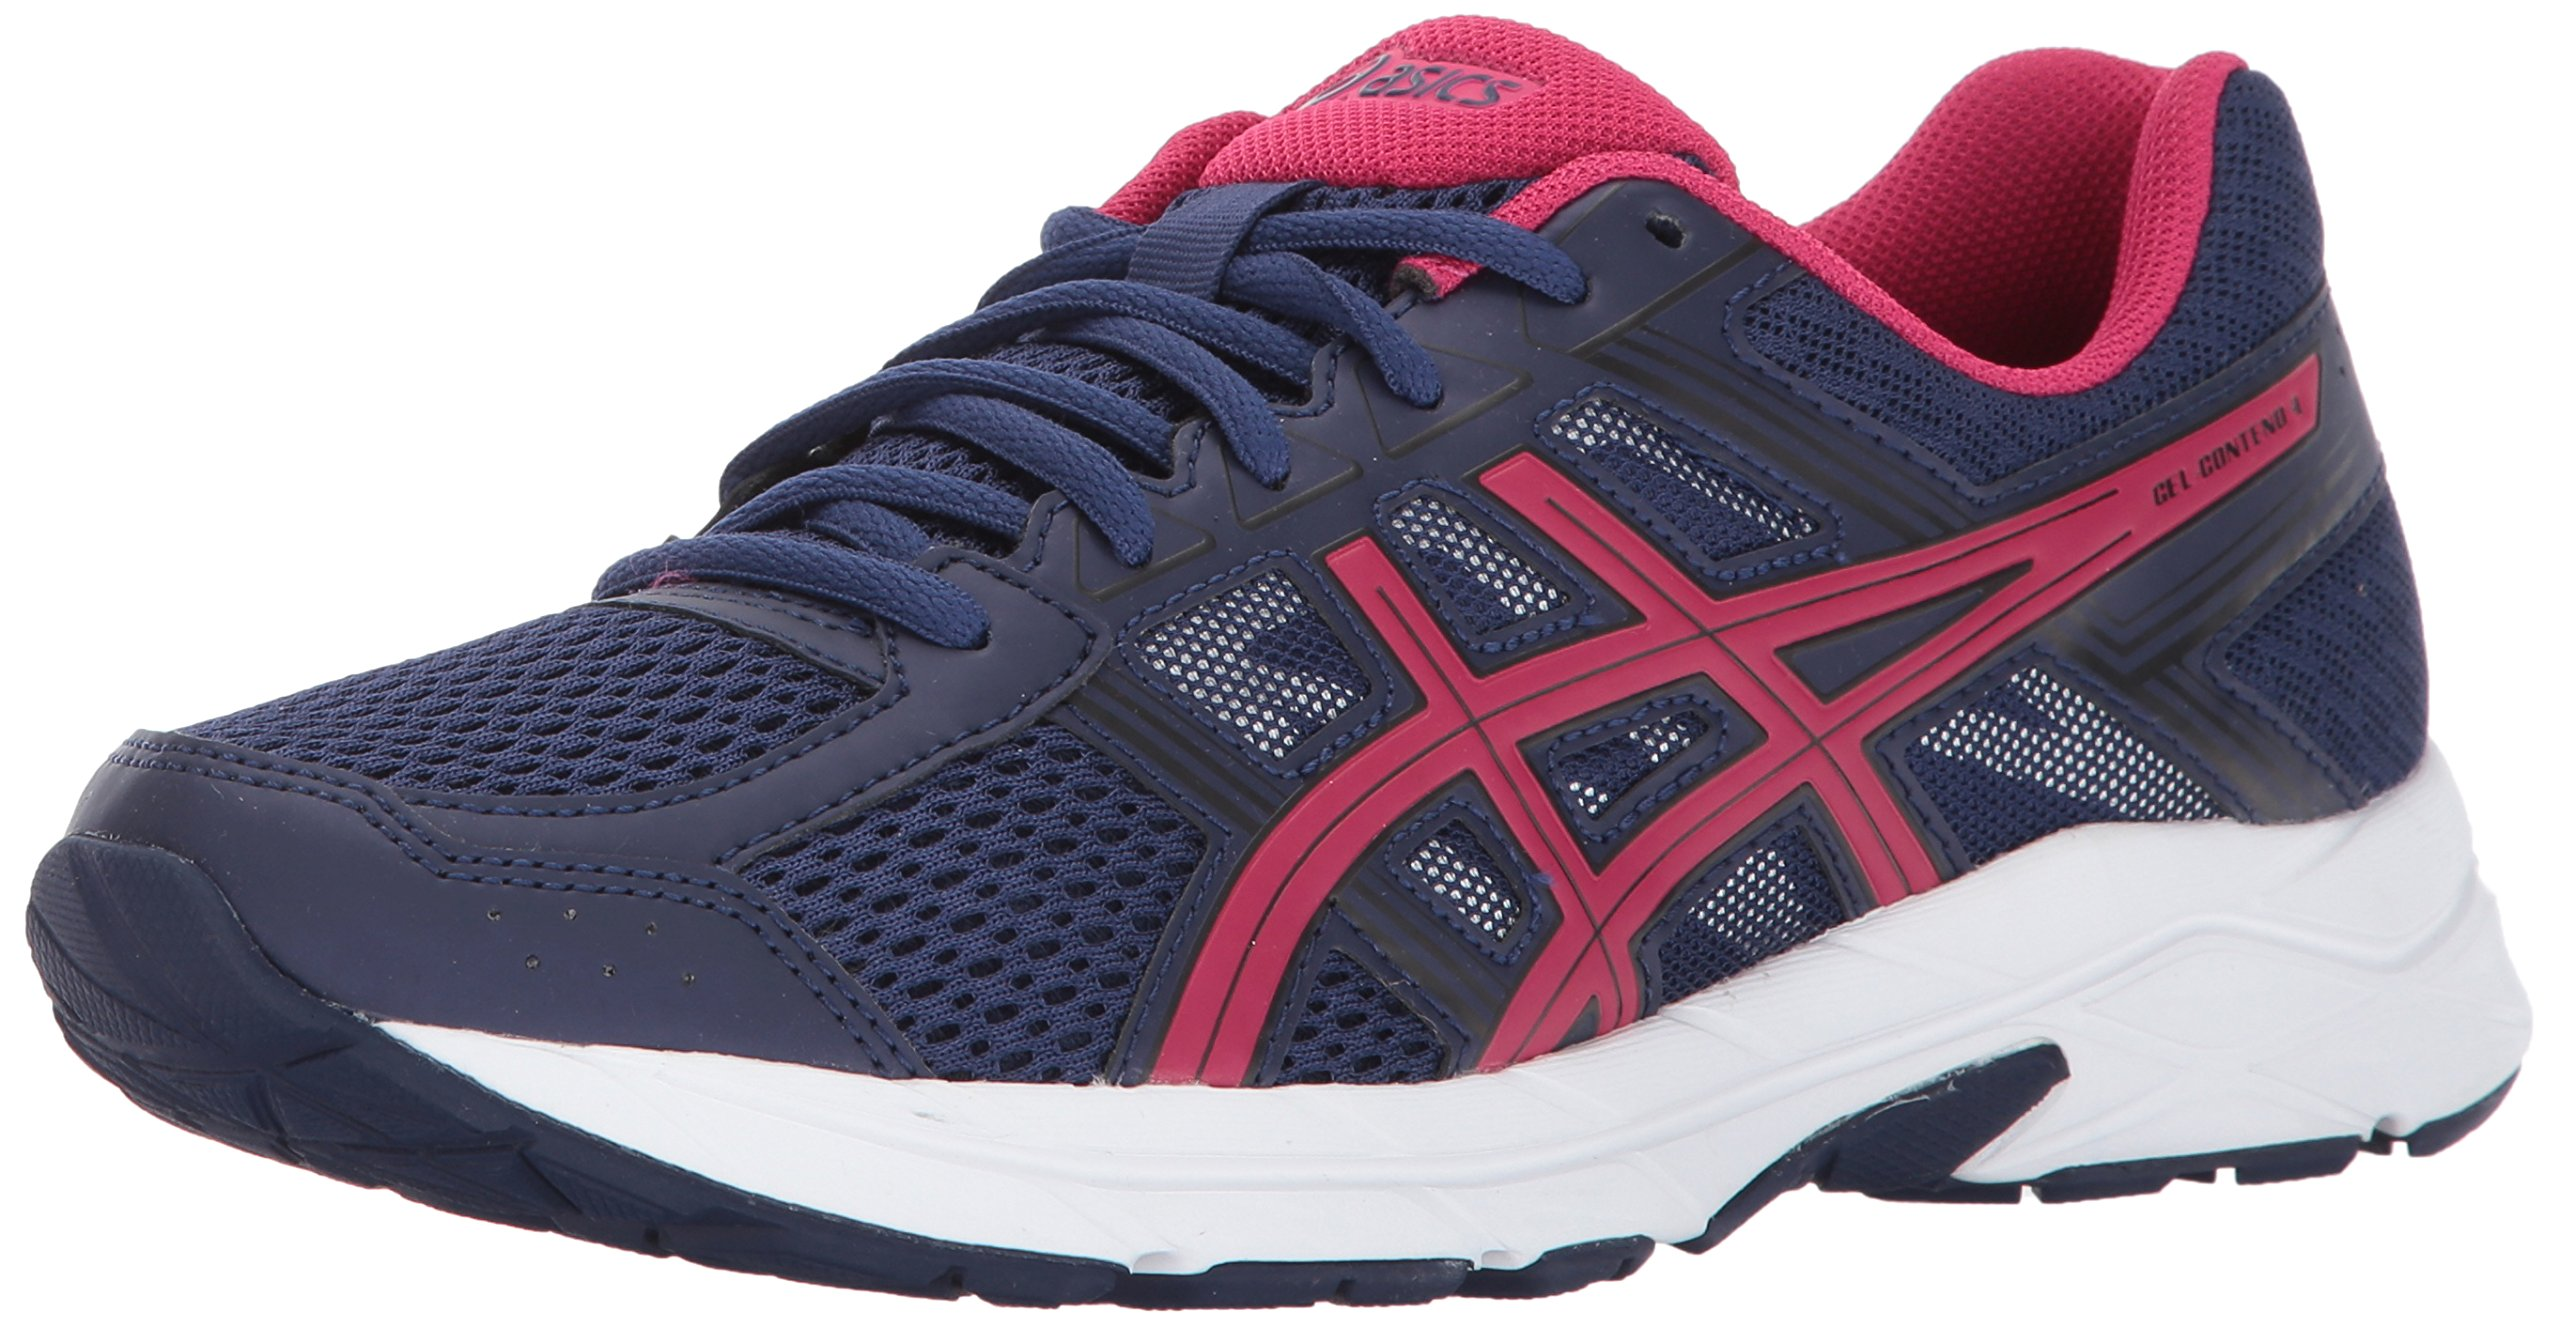 ASICS Womens Gel-Contend 4 Running Shoe Indigo Blue/Cosmo Pink/Black 5 Medium US